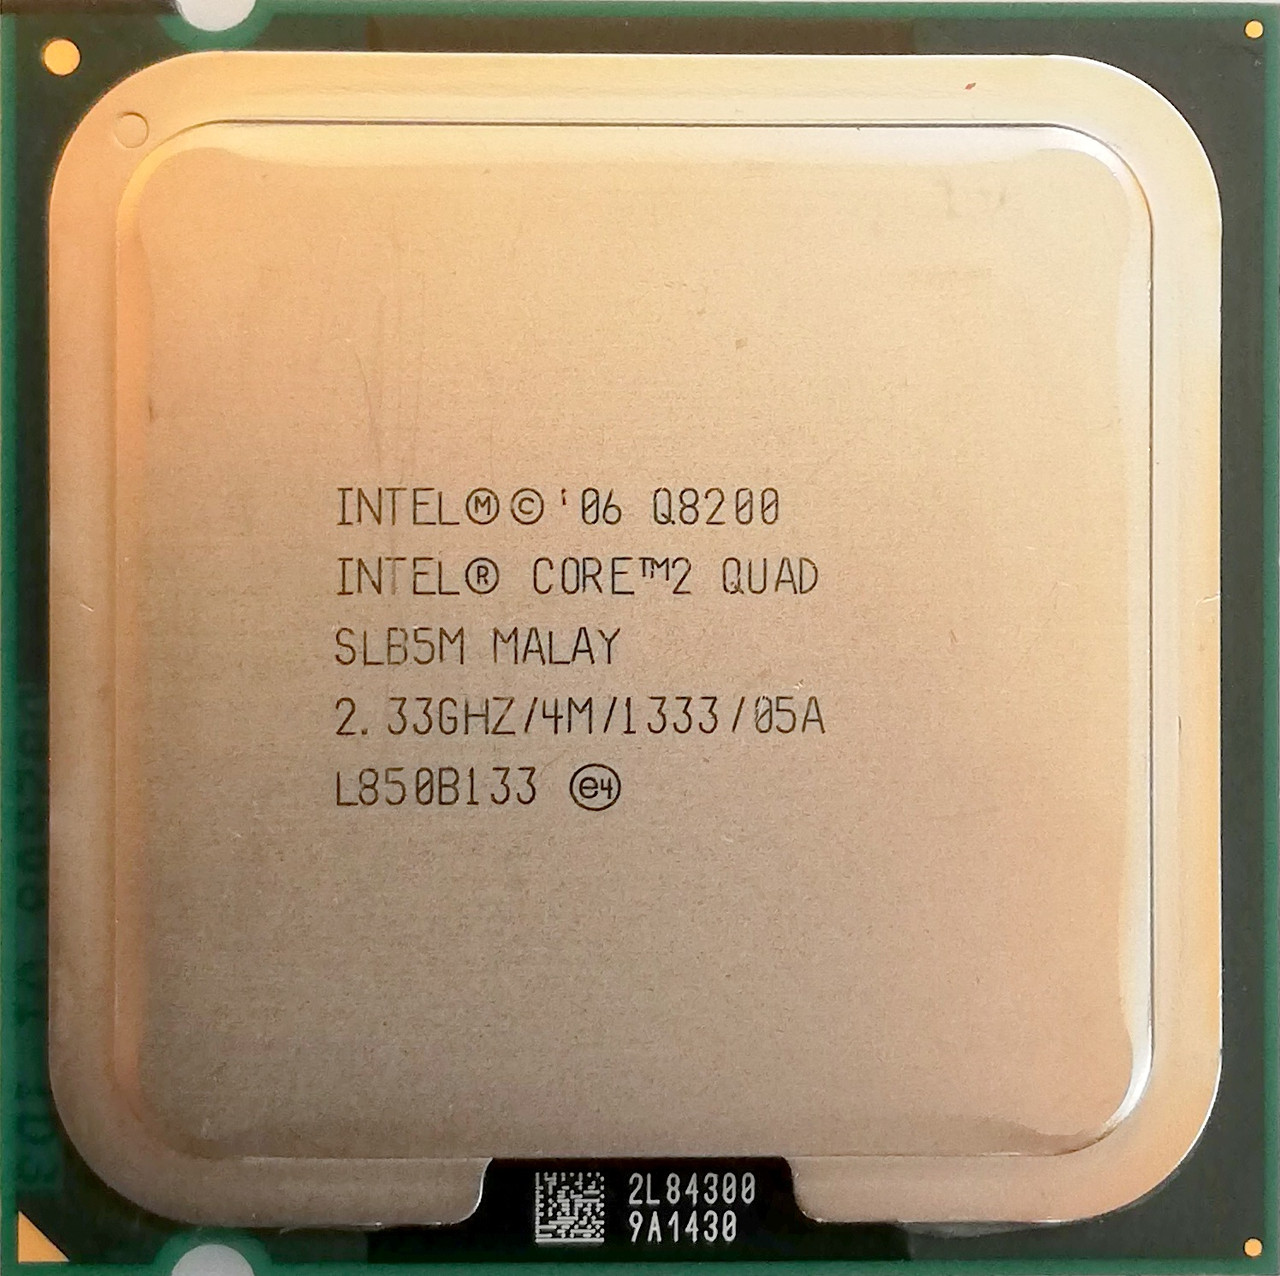 Процессор Intel Core 2 Quad Q8200 M1 SLB5M 2.33 GHz 4 MB Cache 1333 MHz FSB Socket 775 Б/У